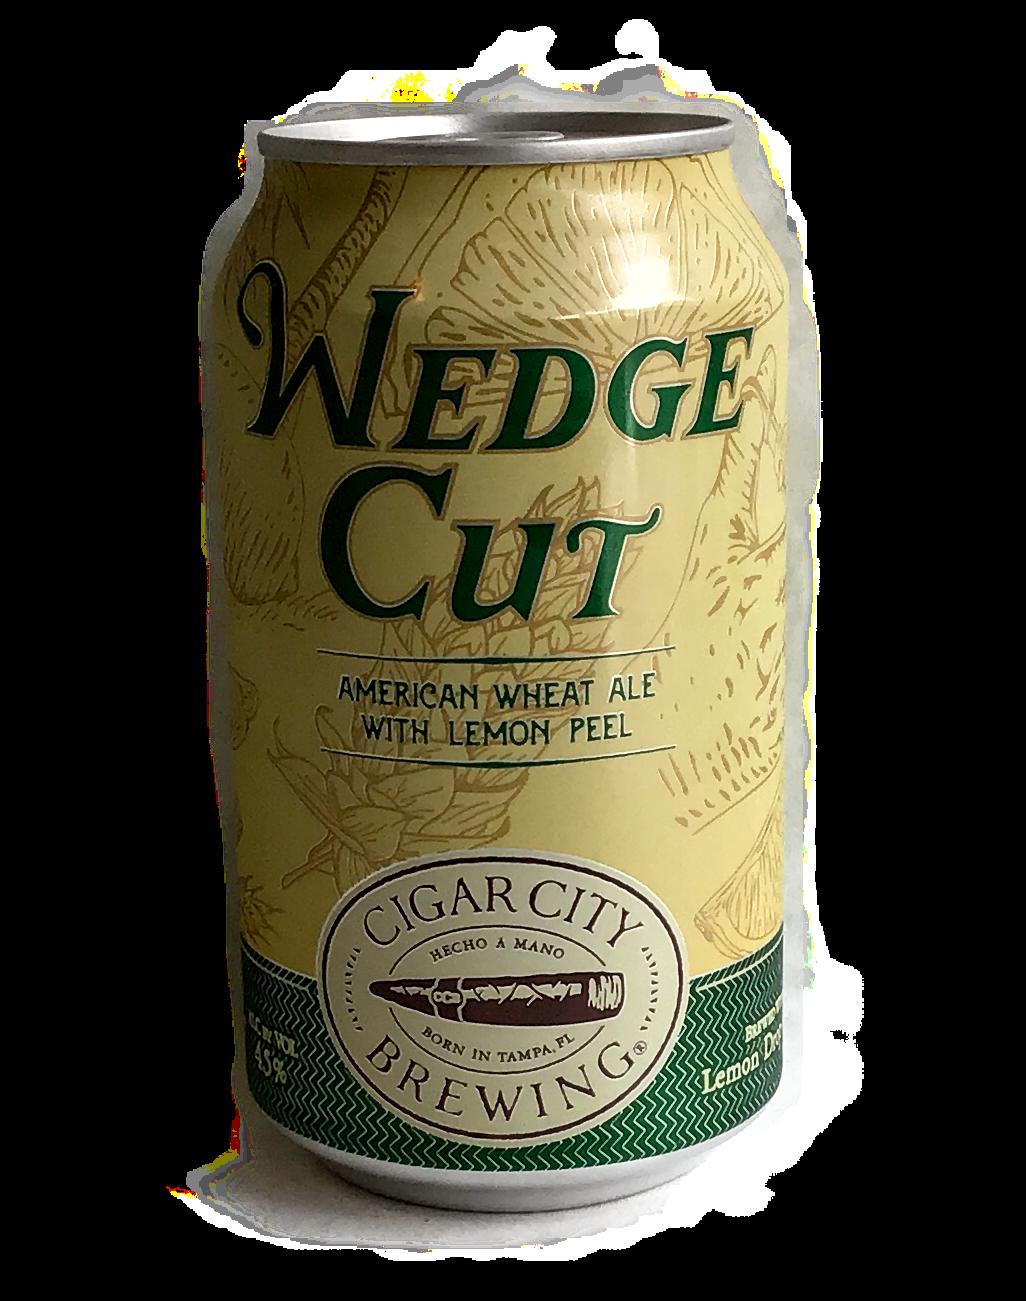 CIgar City Wedge Cut